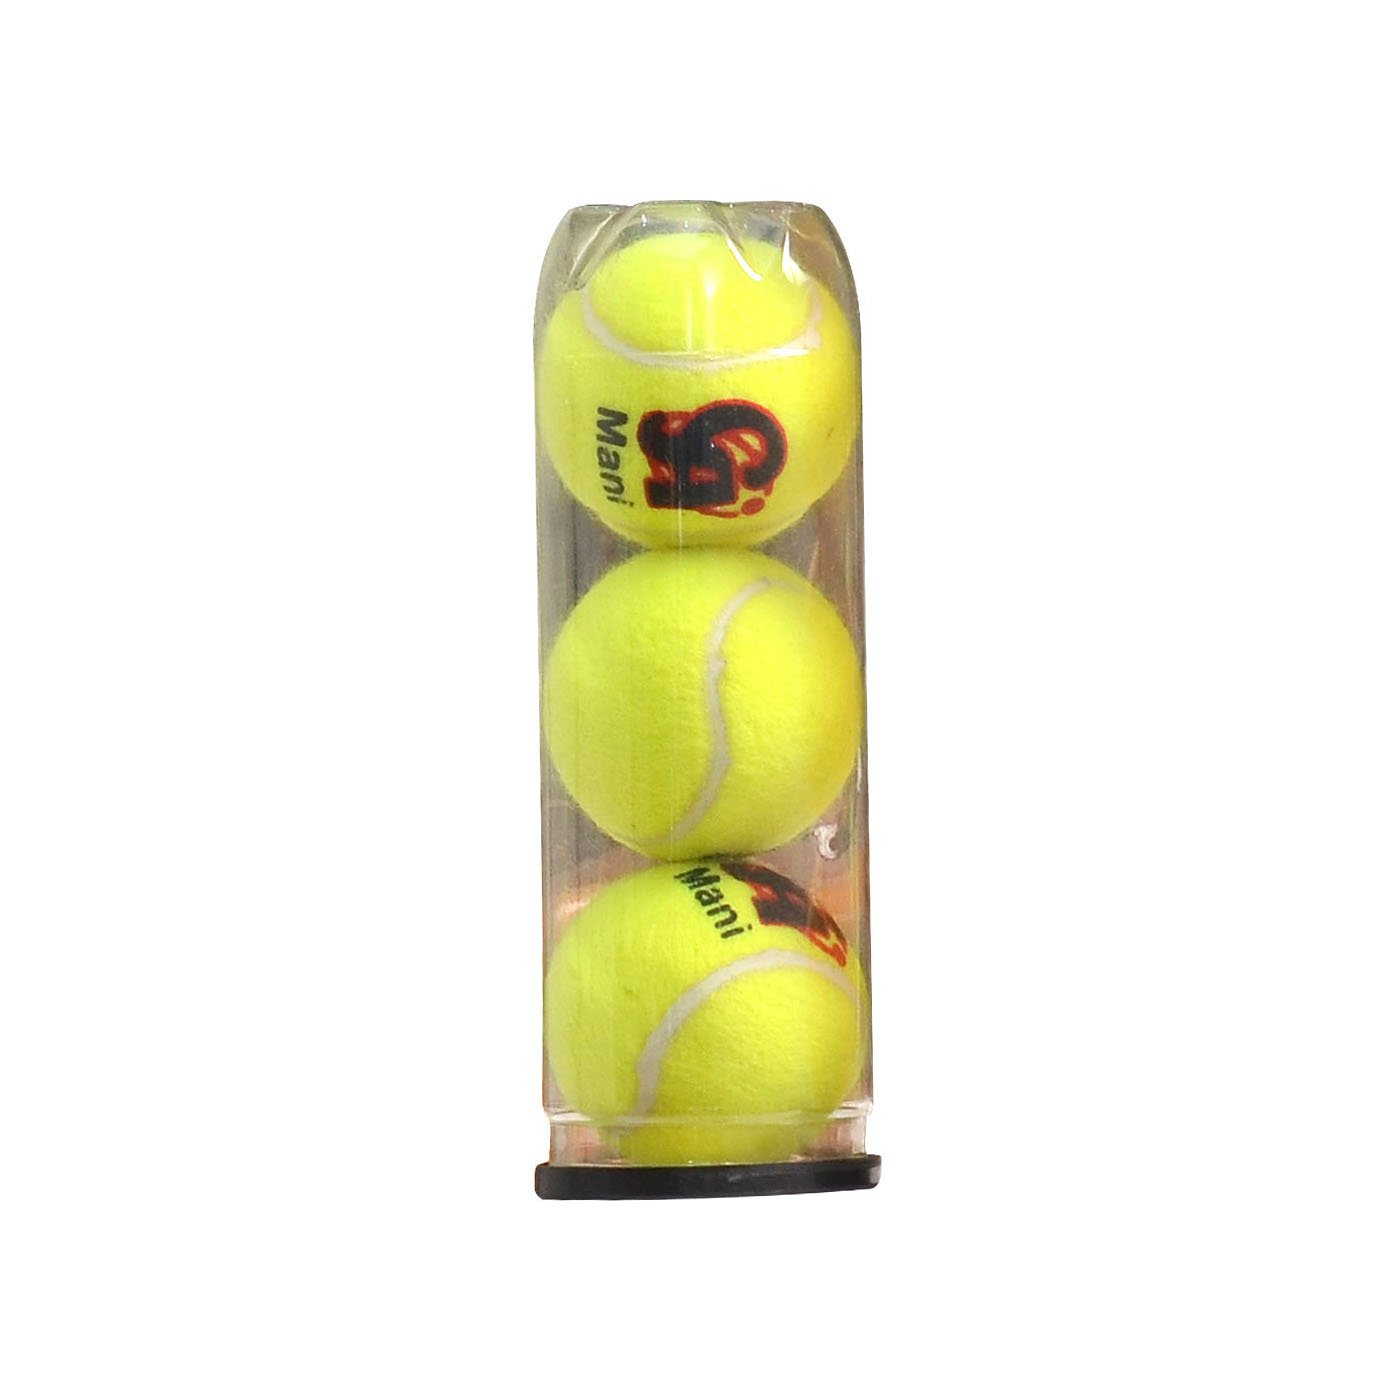 CA Mani Soft Ball tennis ball tape ball Cricket Ball Pack Of  12